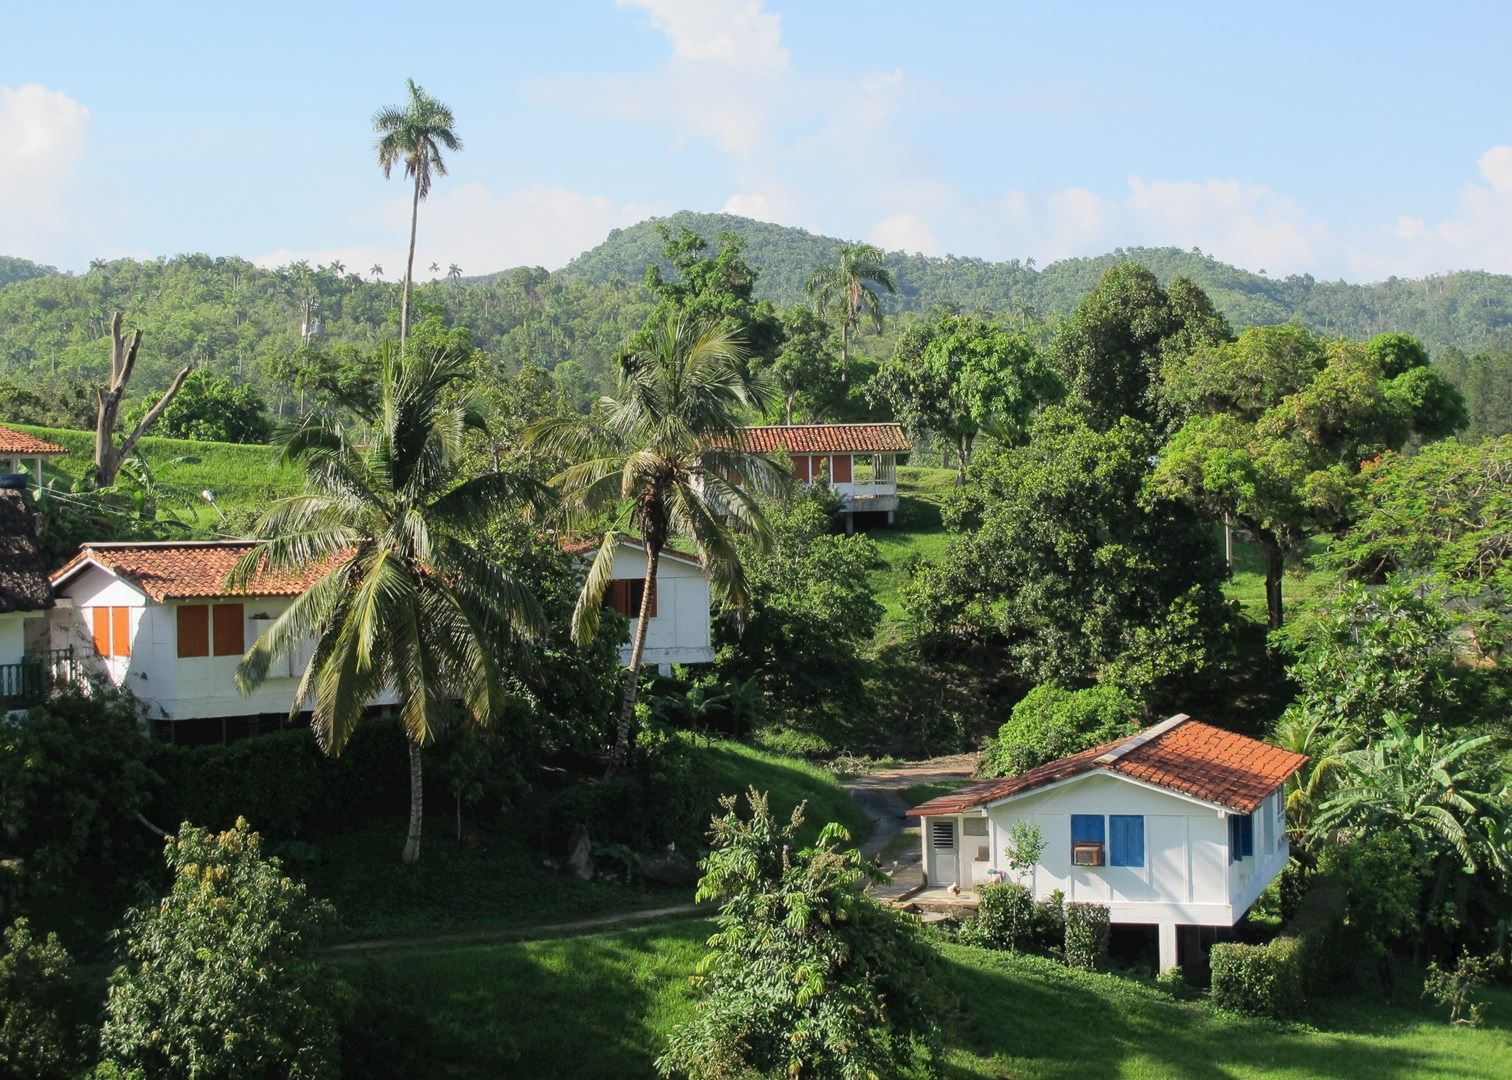 Visit las terrazas on a trip to cuba audley travel for Terrazas de